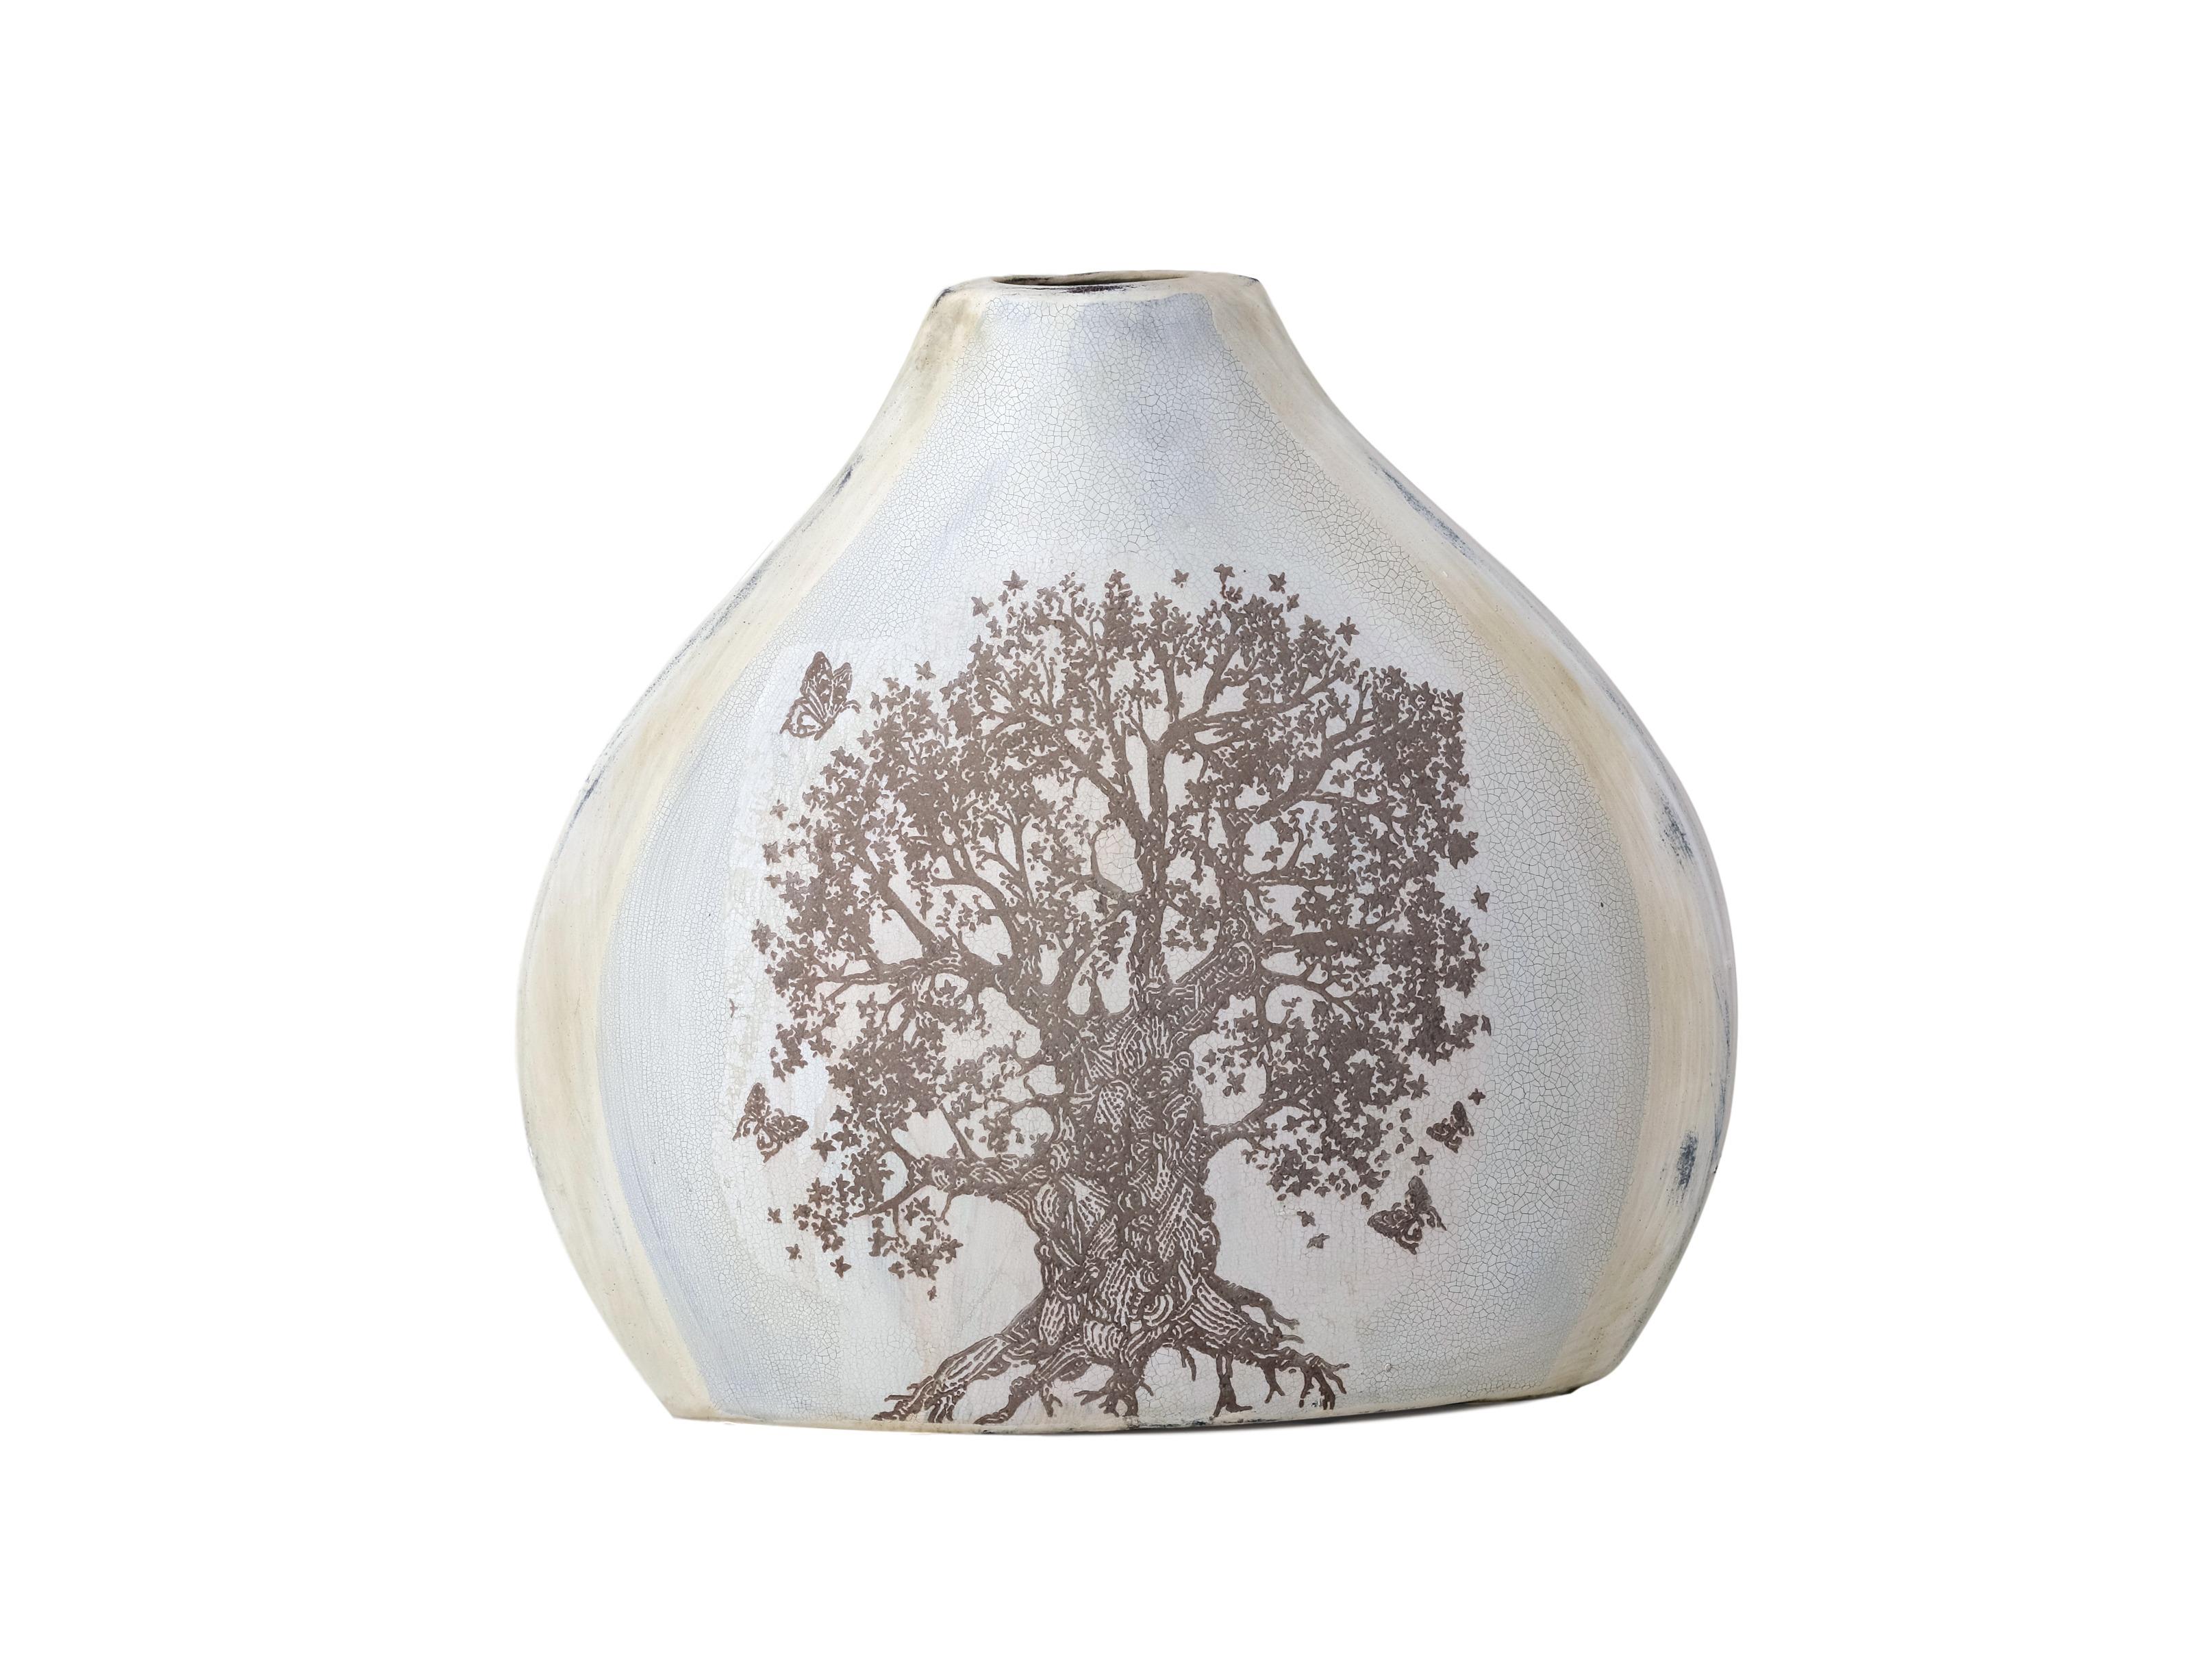 ВазаВазы<br>Ваза плоская с рисунком &amp;quot;Дерево&amp;quot; и старением.<br><br>Material: Керамика<br>Width см: 37<br>Depth см: 1,1<br>Height см: 36